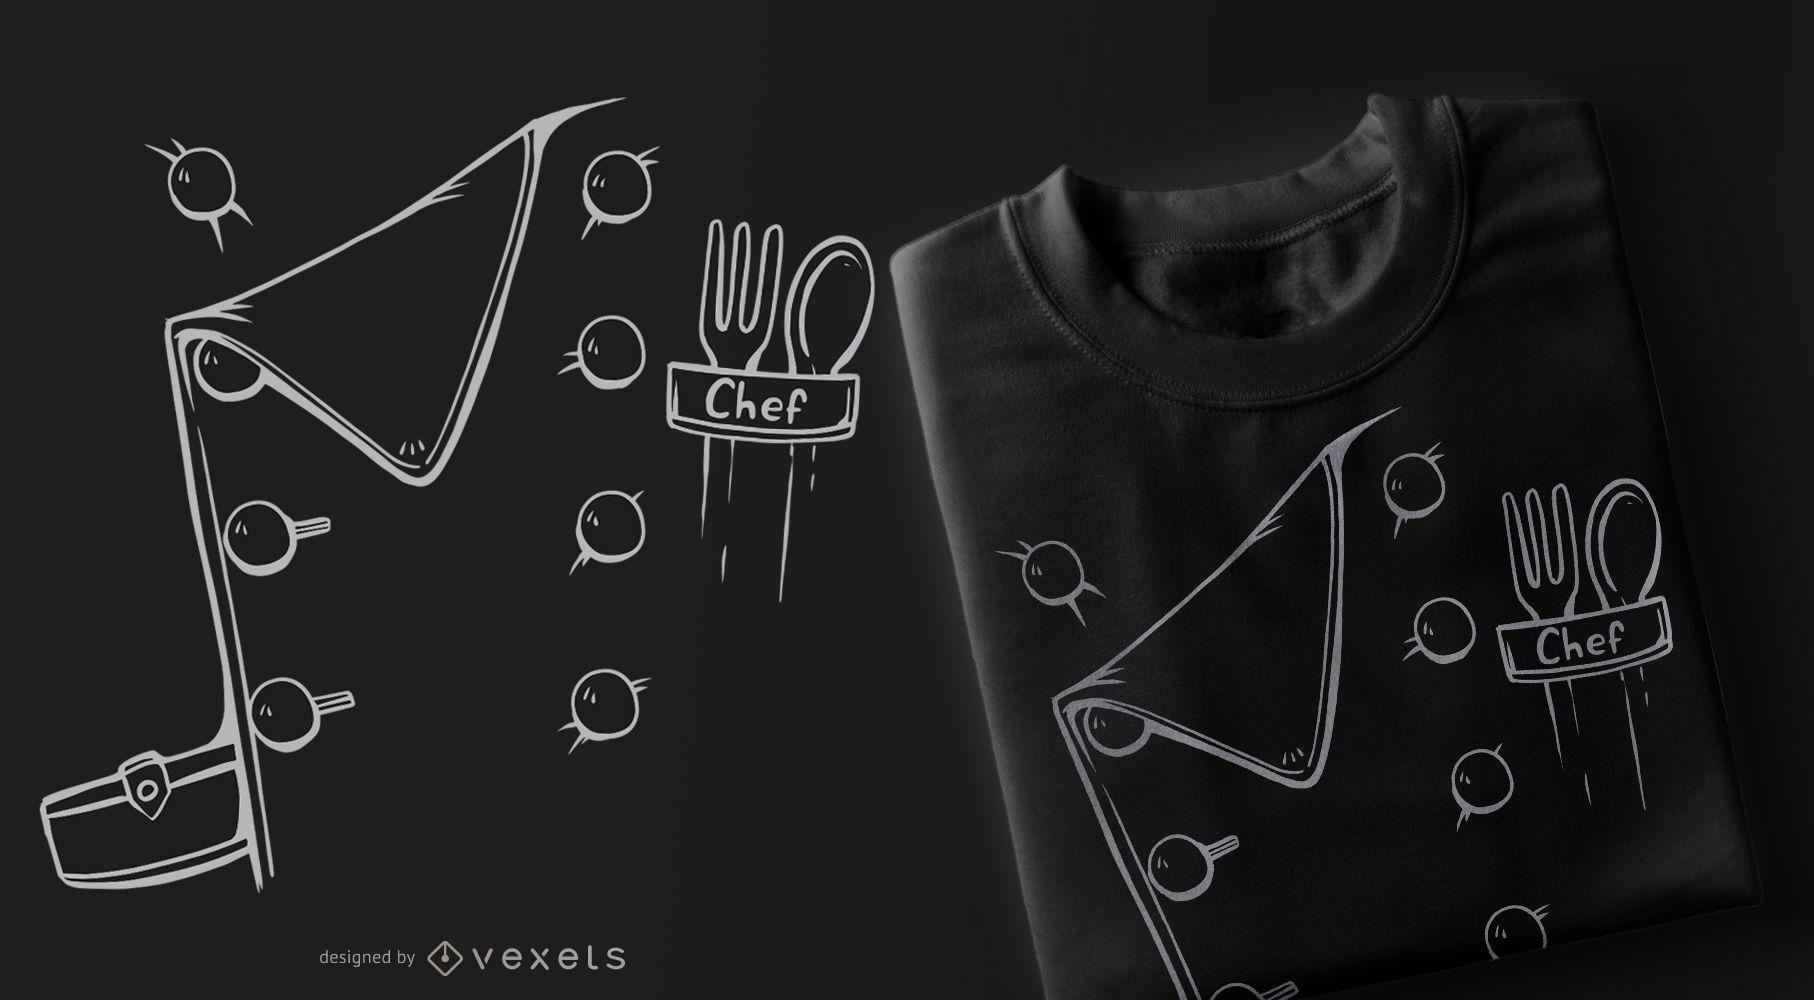 Chef Costume T-shirt Design